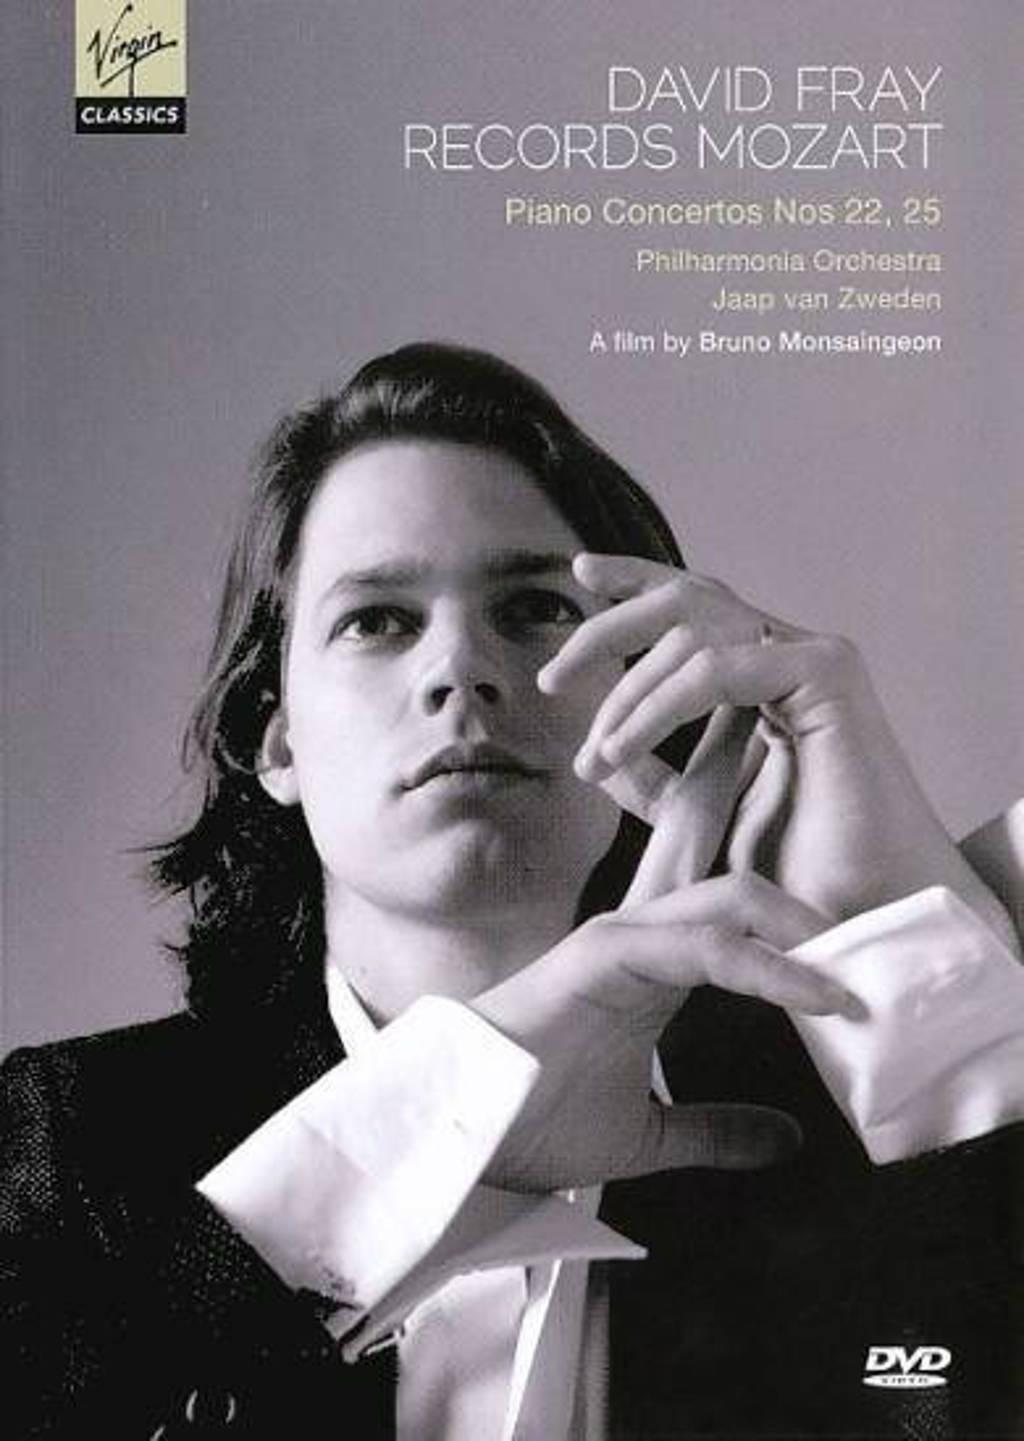 David Fray/Philharmonia Orchestra - Mozart Concertos No 22, 25 (DVD)